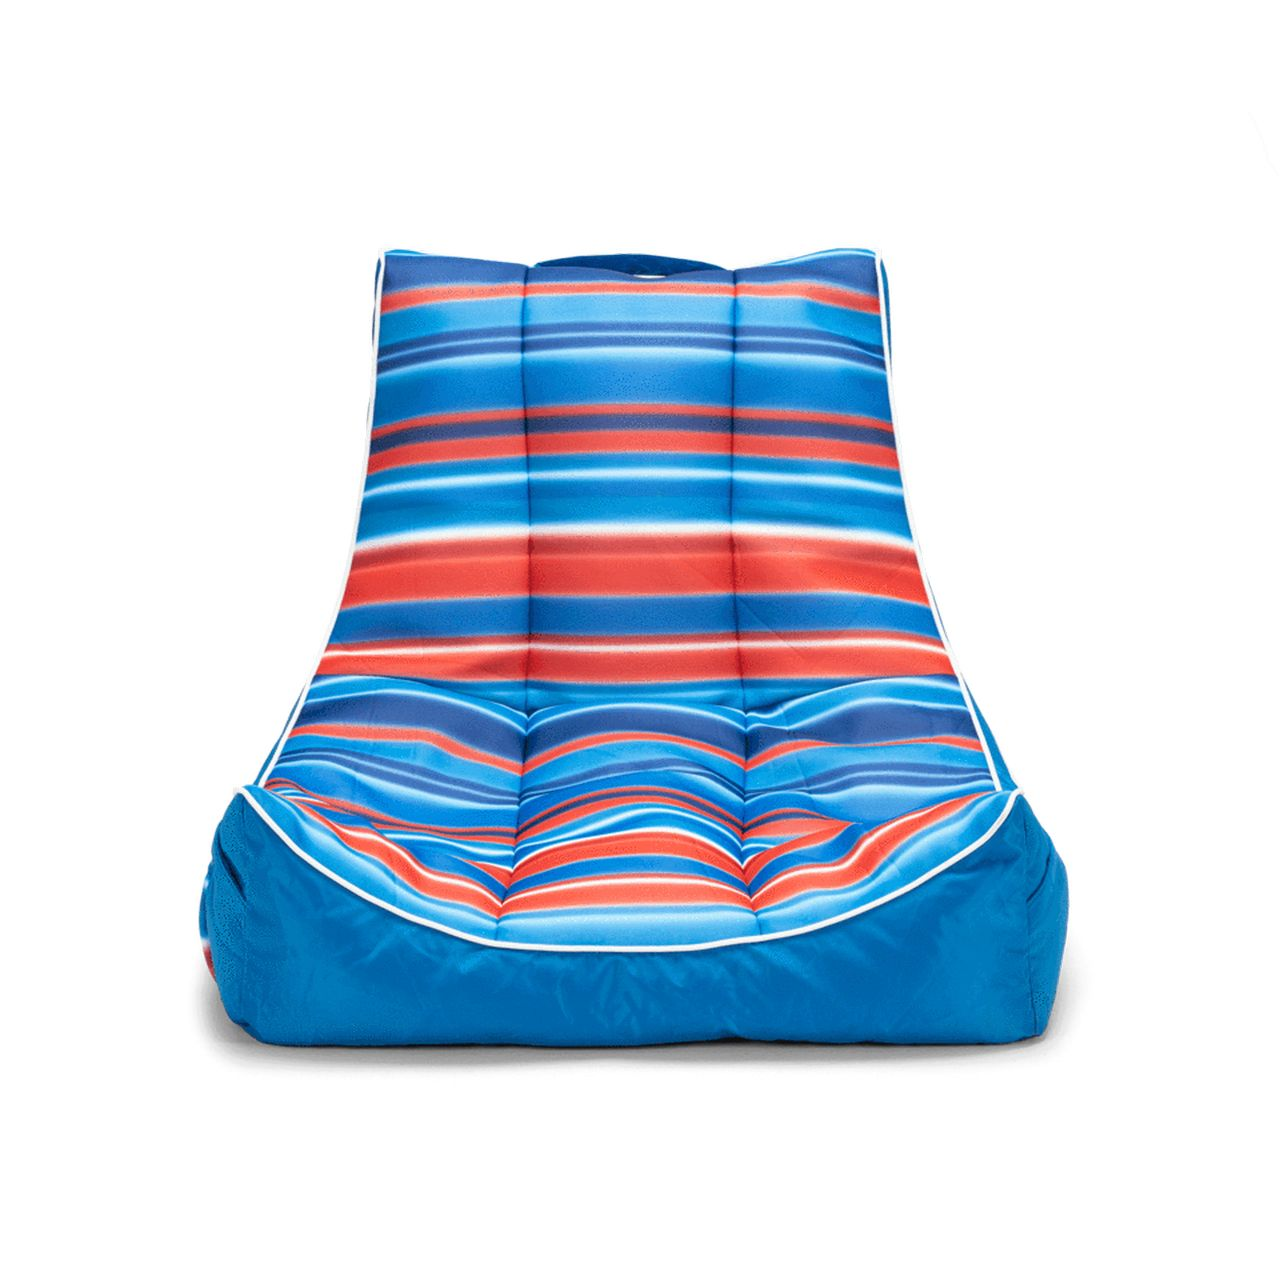 Big Joe Captain's Pool Float - Blurred Americana